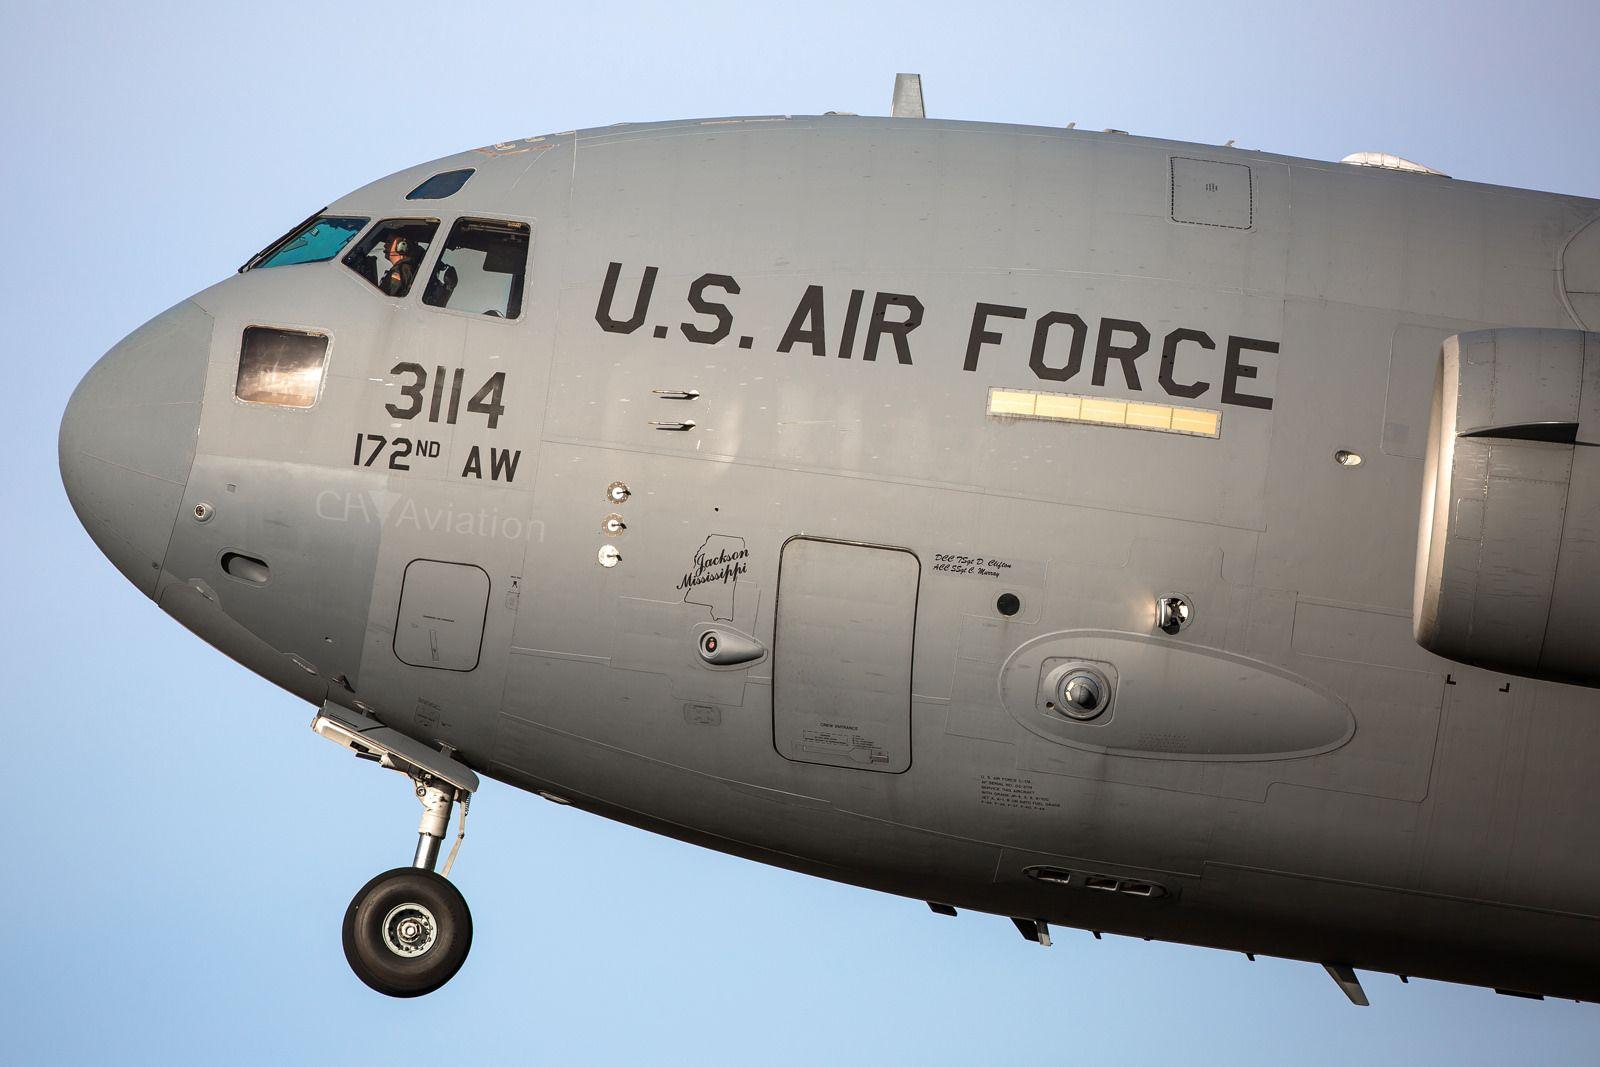 C-17A Globemaster III, 172nd AW, 03-3114